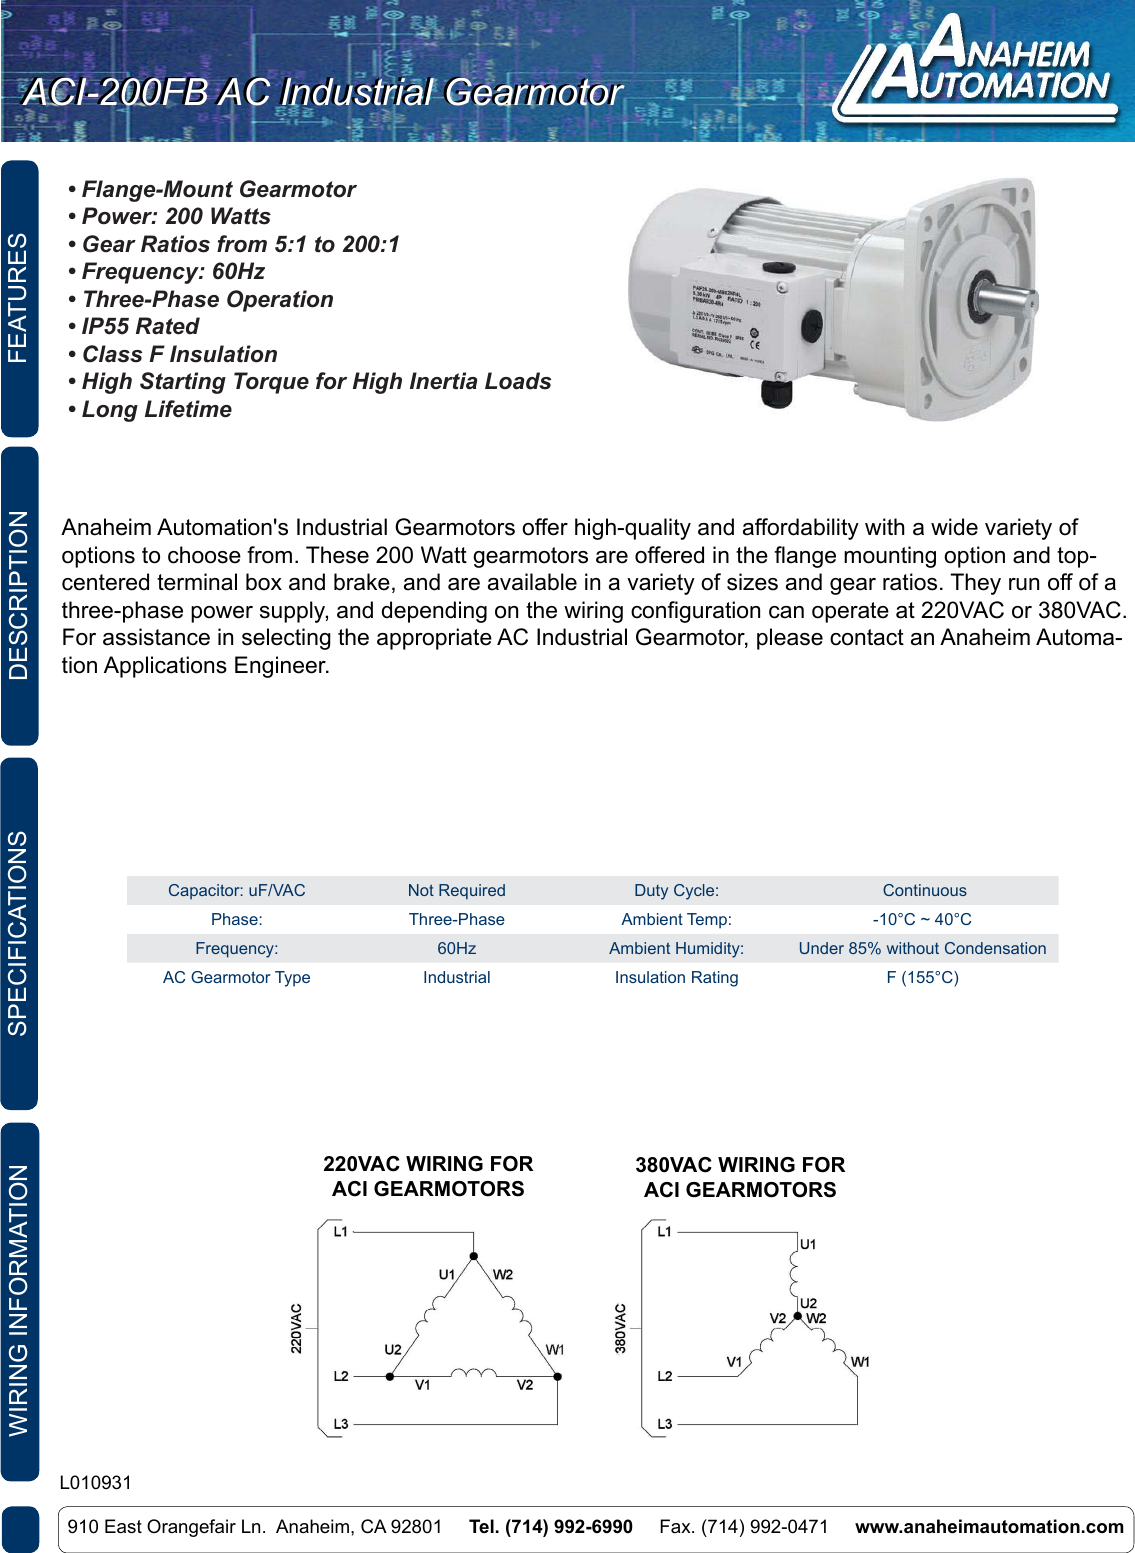 L010931 Aci 200fd Ac Industrial Gearmotor Spec Sheet 220 Vac Wiring